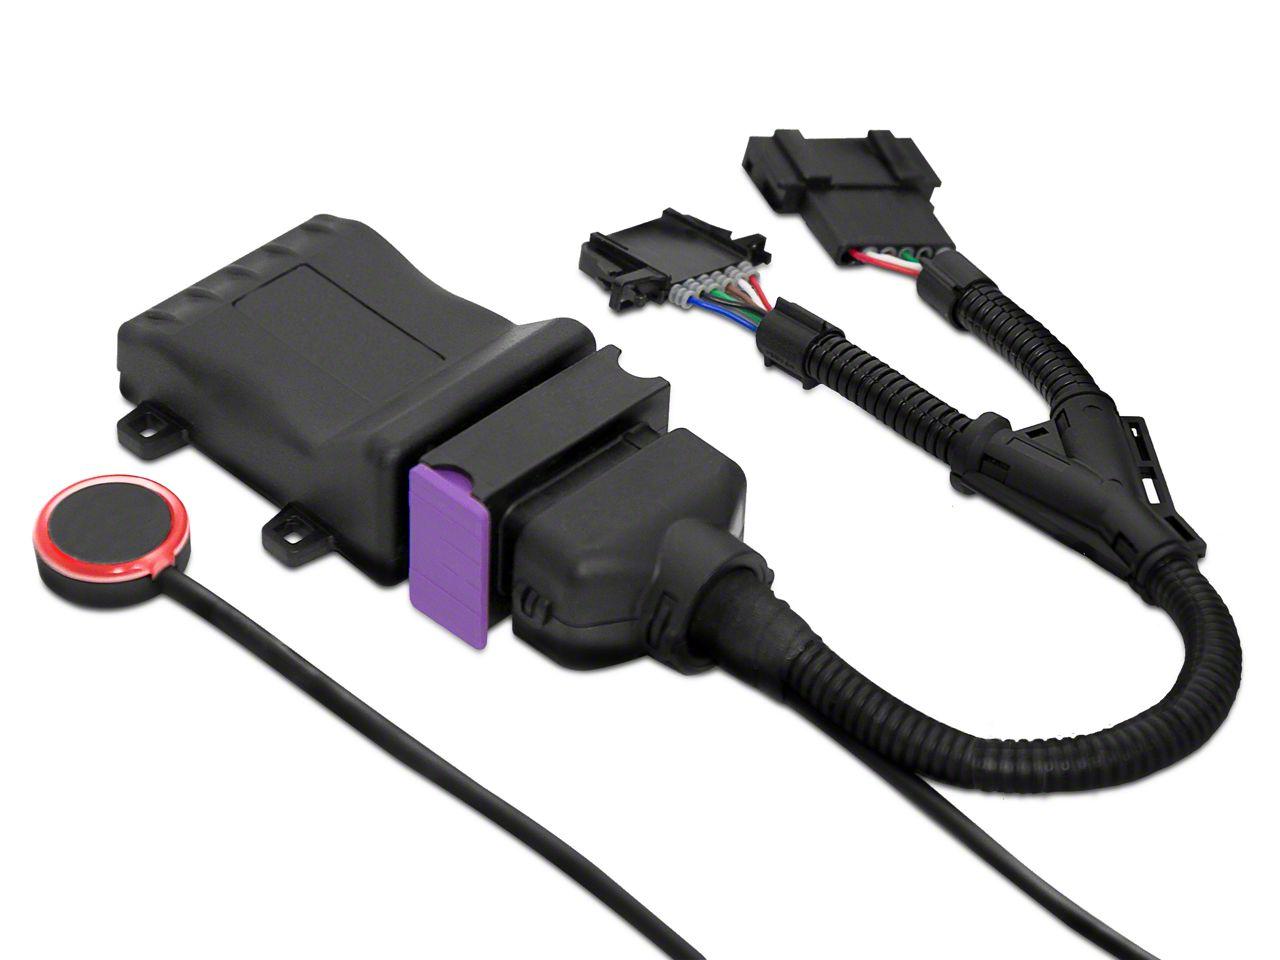 SEC10 Throttle Response Controller (10-18 Jeep Wrangler JK)